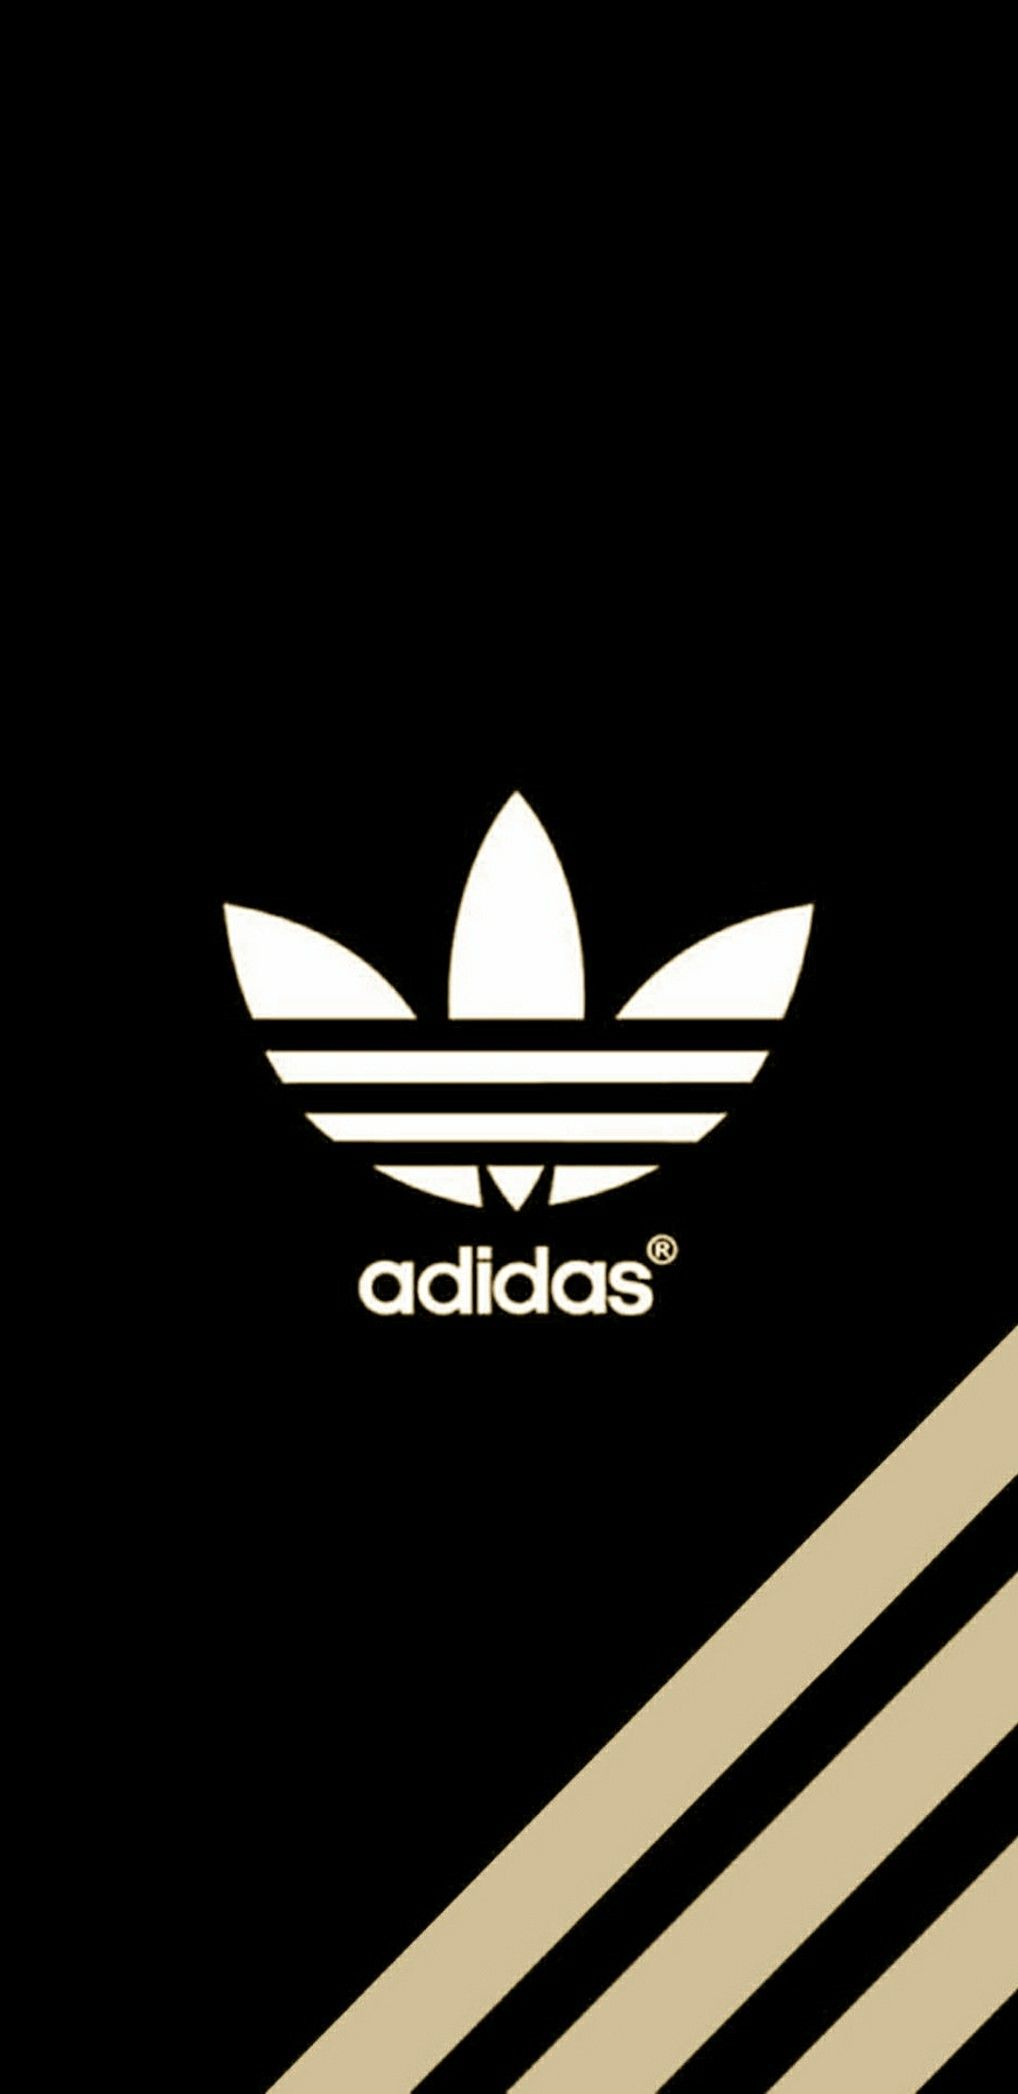 Adidas Three Stripes Iphone Wallpaper Background Adidas Wallpapers Stripe Iphone Wallpaper Adidas Wallpaper Iphone